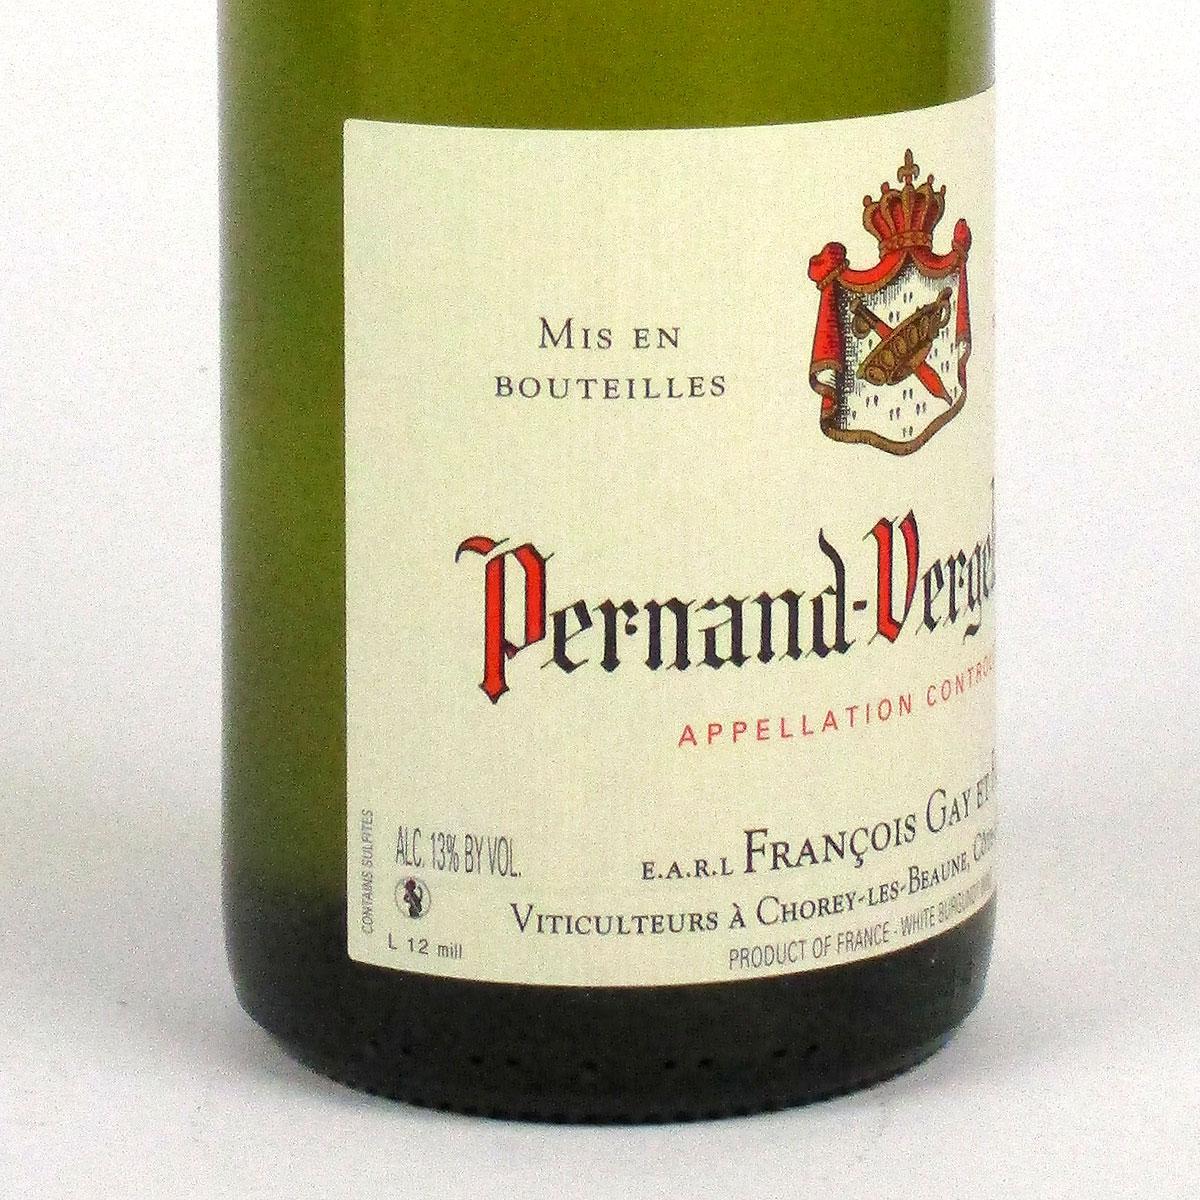 Pernand-Vergelesses: Domaine François Gay & Fils 2019 - Bottle Label Side